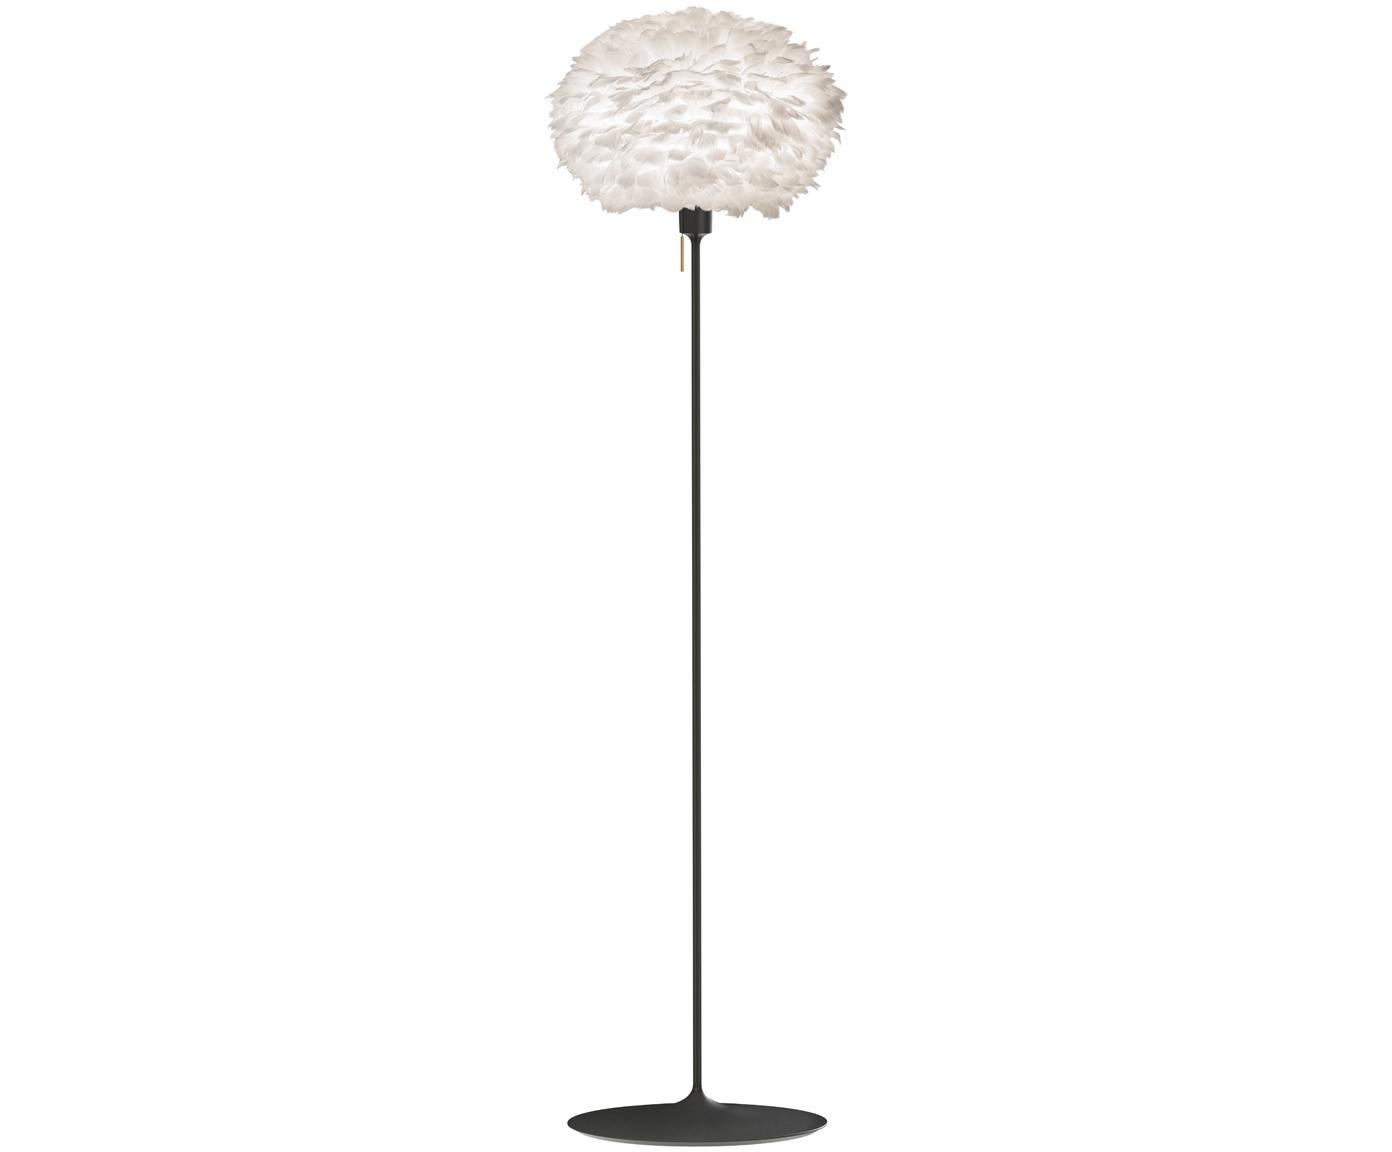 Lámpara de pie de plumas Eos, Pantalla: plumas de ganso, acero, Blanco, negro, Ø 45 x Al 170 cm